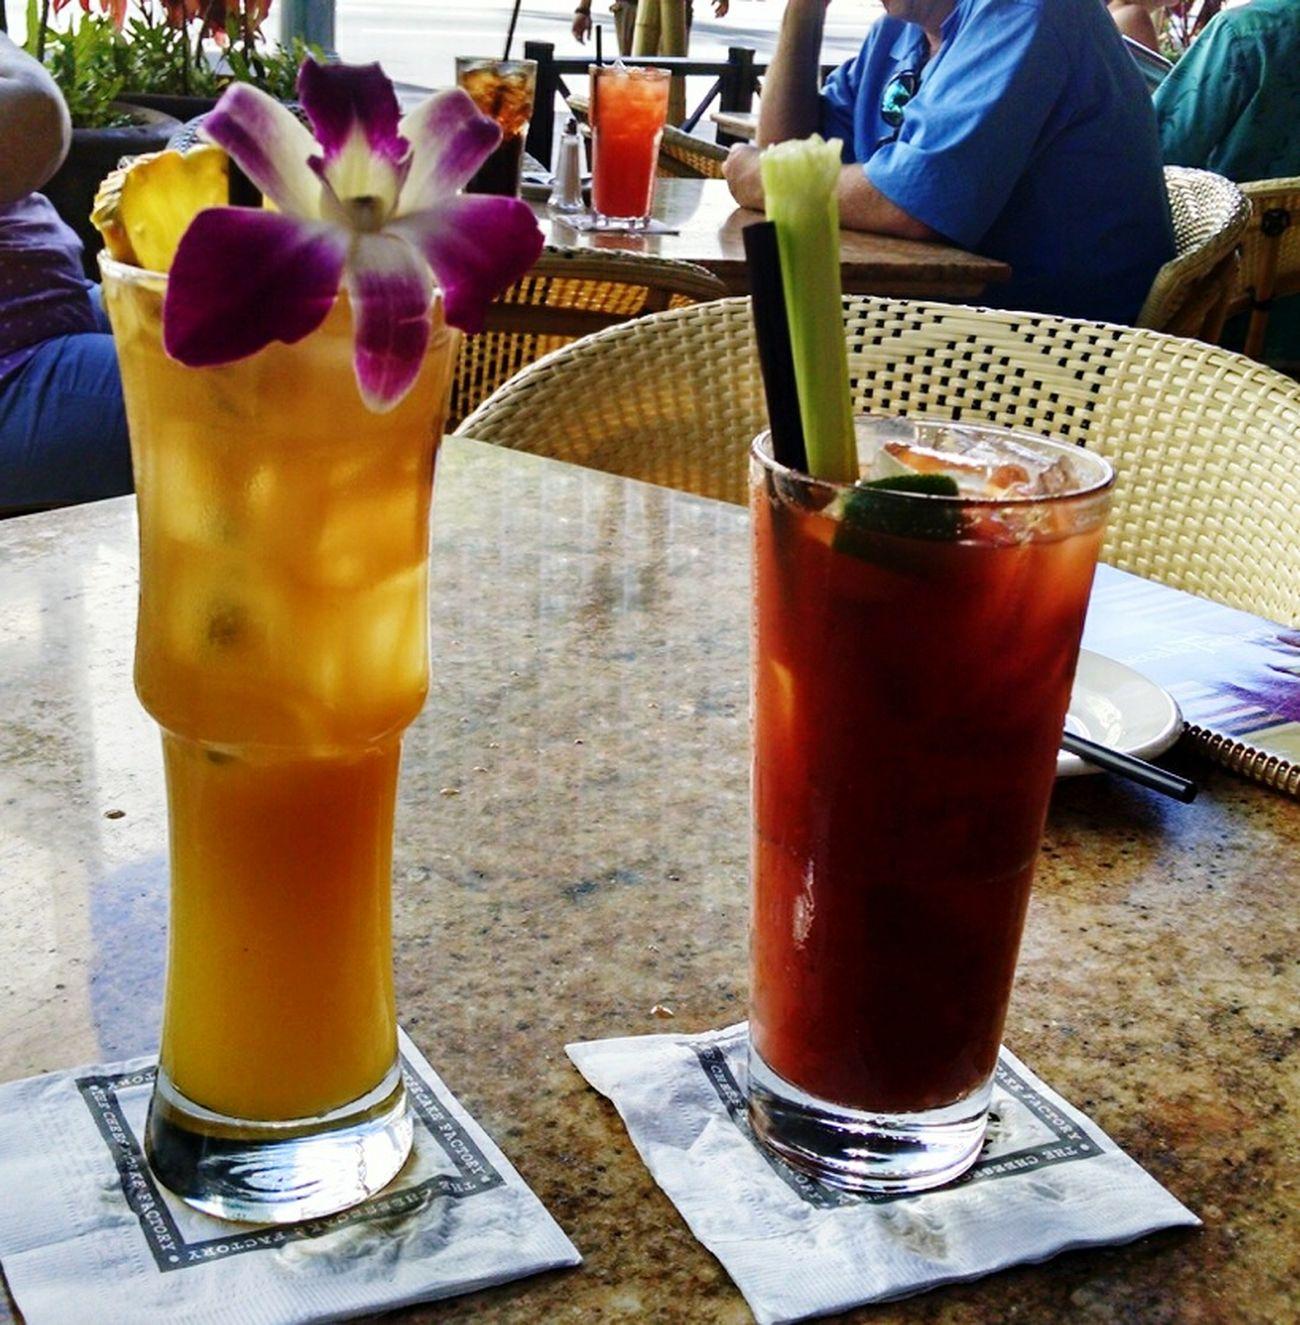 Yes Maitai & a Bloodymary Drinks Food just before leaving Paradise Honolulu, Hawaii Vacations Fun Times Beautiful Place USA